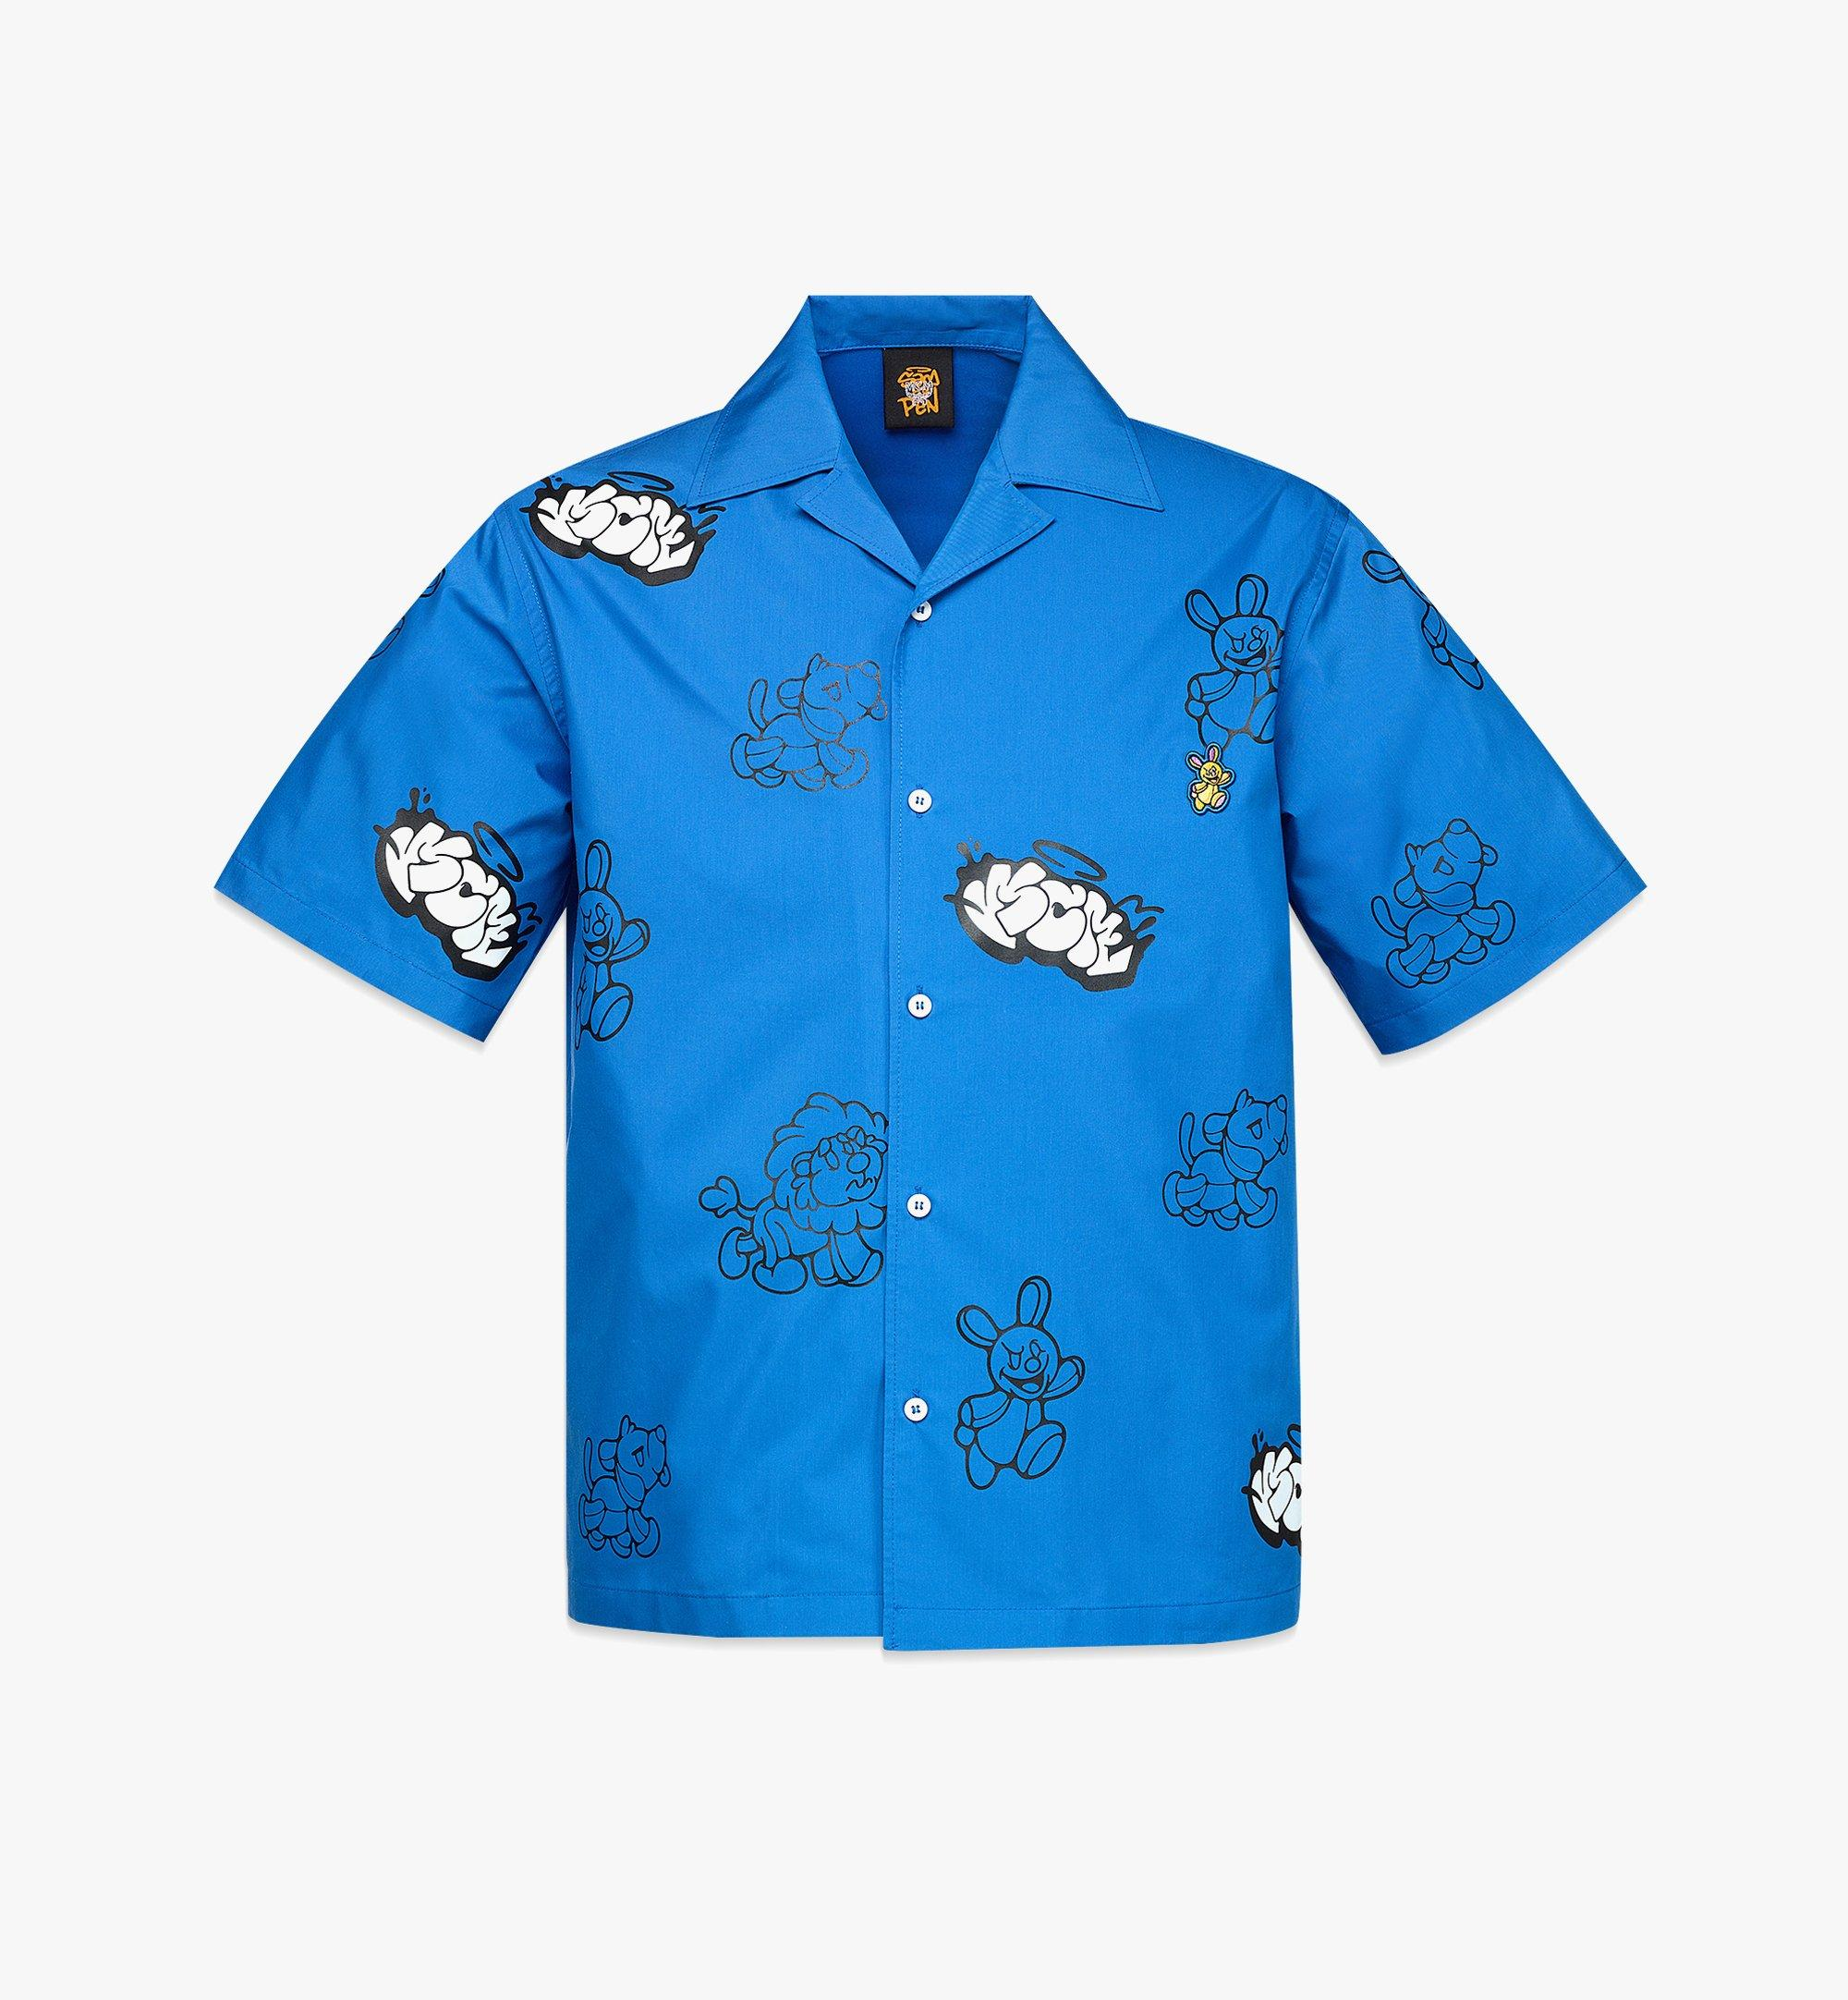 MCM MCM x SAMBYPEN Men's Short Sleeve Shirt Blue MHHBASP01LU00L Alternate View 1